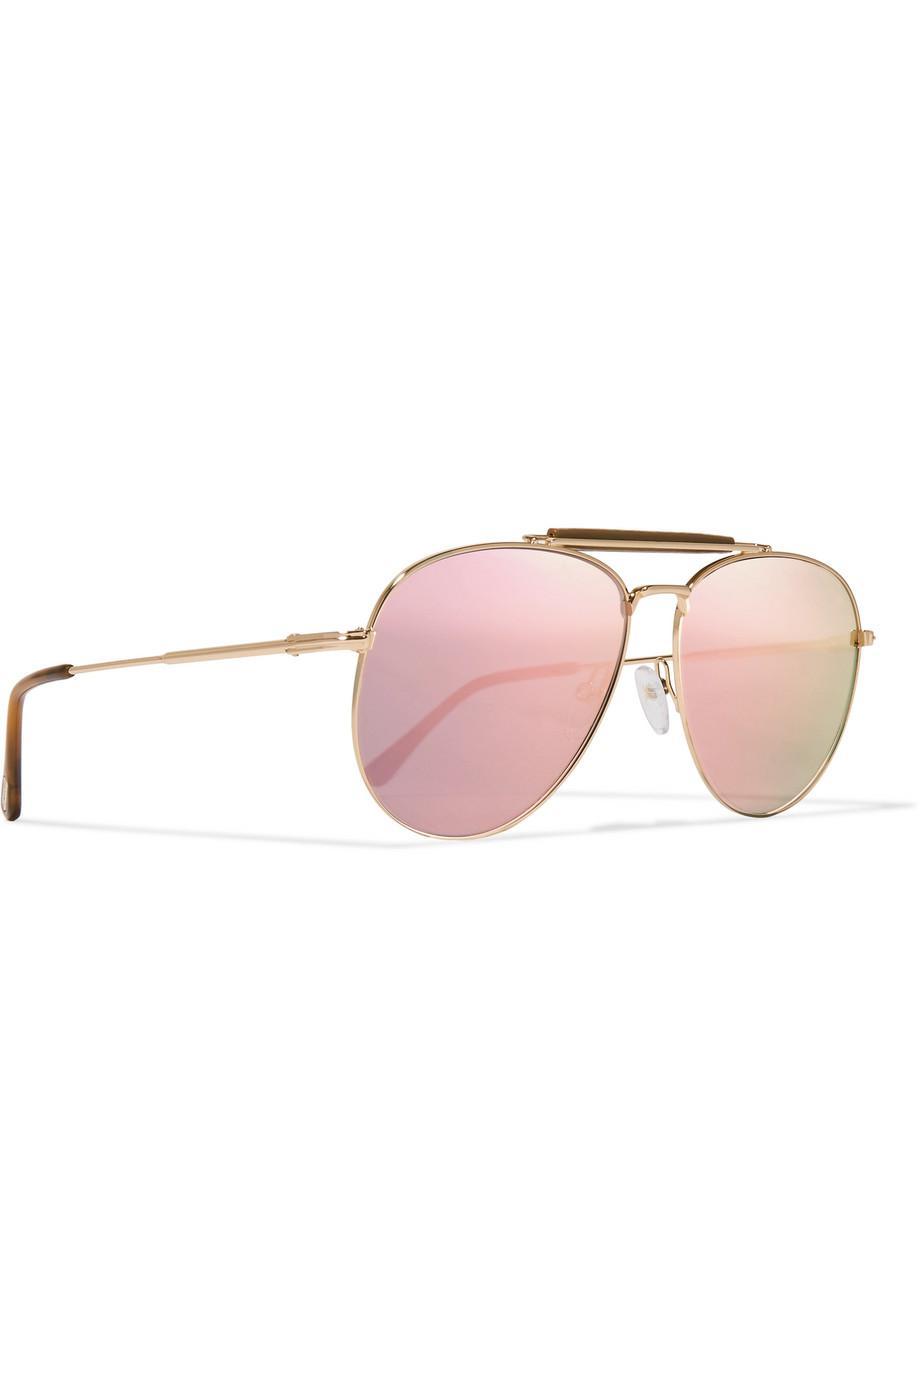 Sean Aviator-style Rose Gold-tone Mirrored Sunglasses - Pink Tom Ford cjlYM